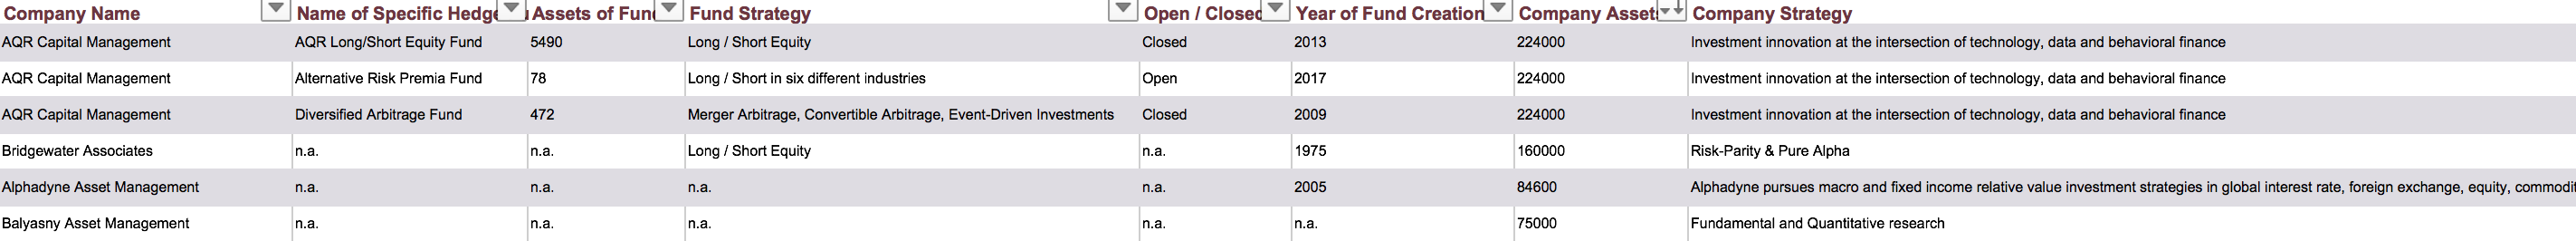 hedgefund list activist investors quantiative firms overview